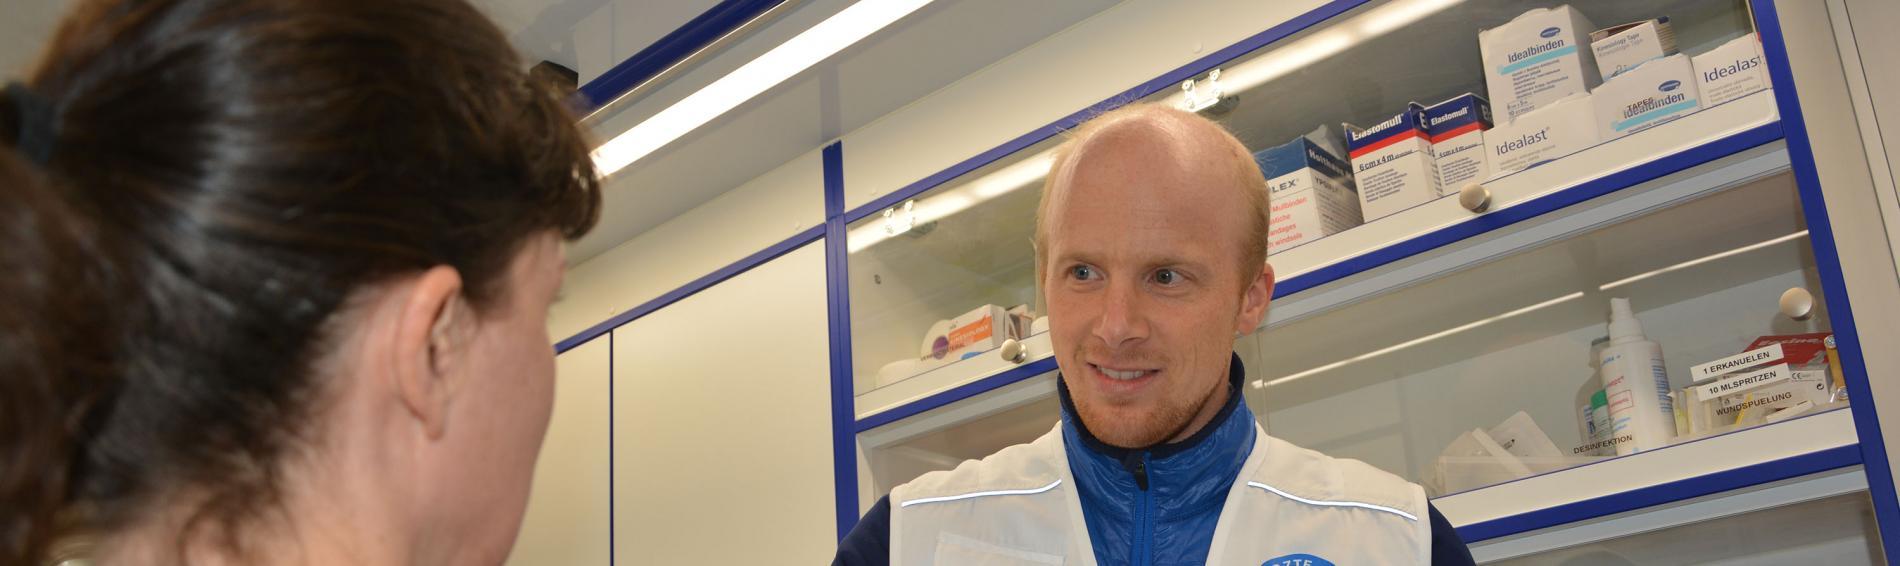 Jakob Reineke, MedMobil Stuttgart. Foto: Isabell Hoch